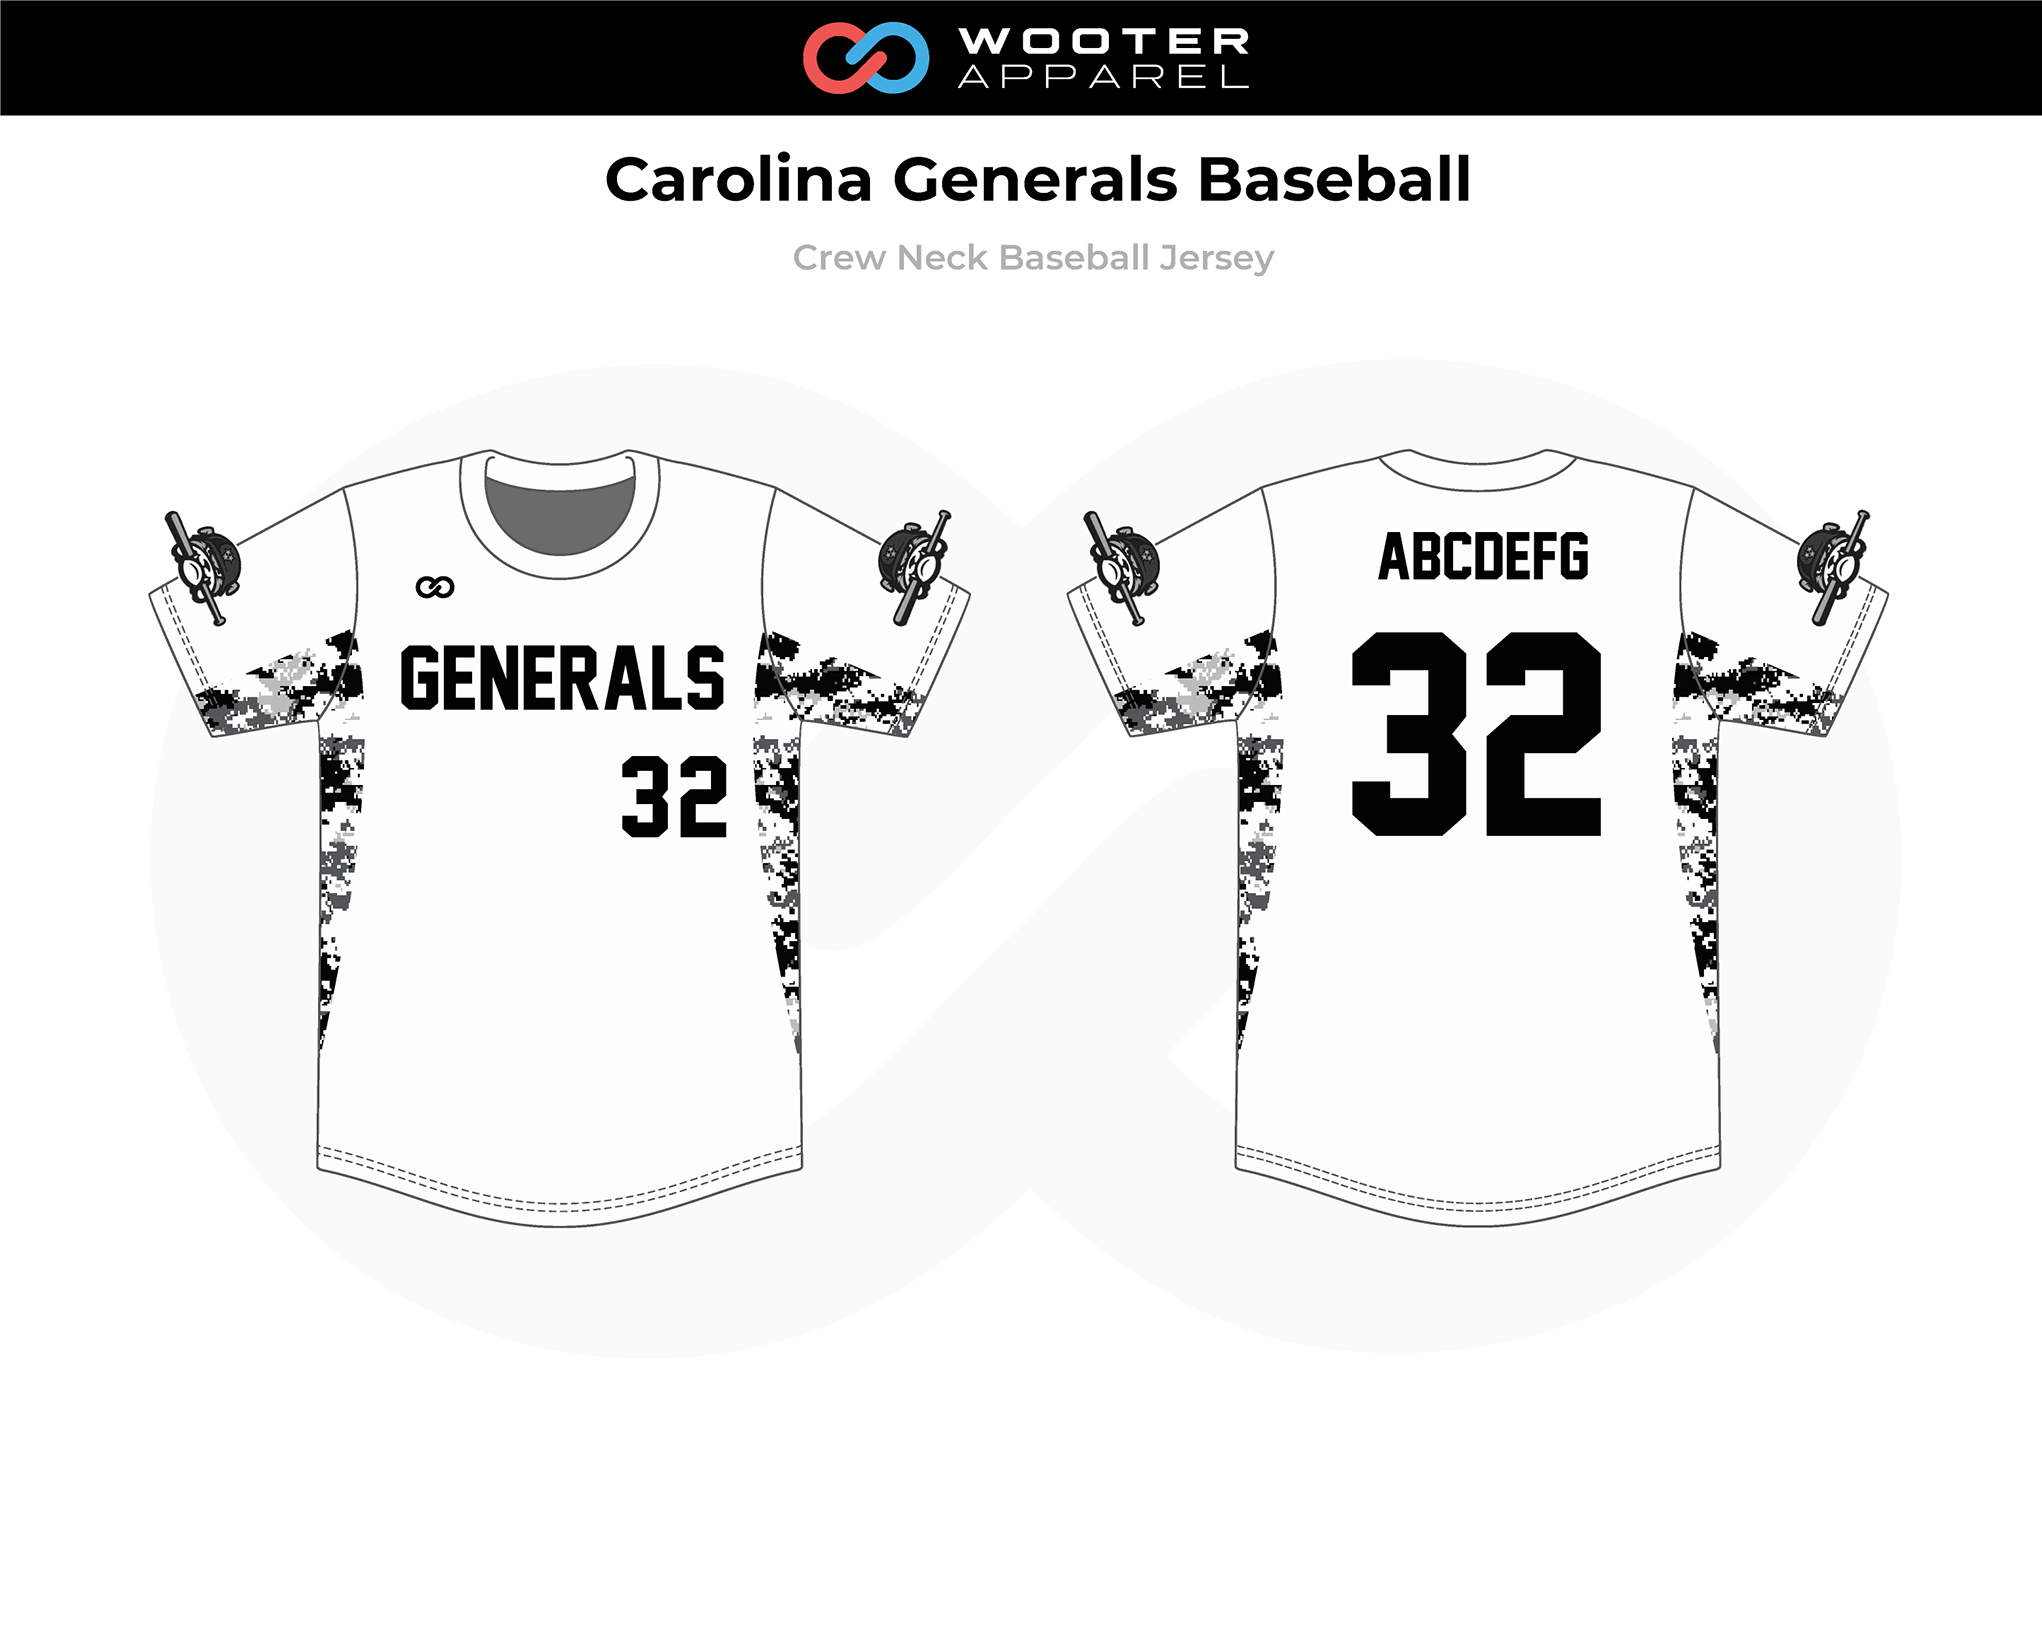 2018-01-10 Carolina Generals Baseball Crew-Neck Pullover Jersey (White).png